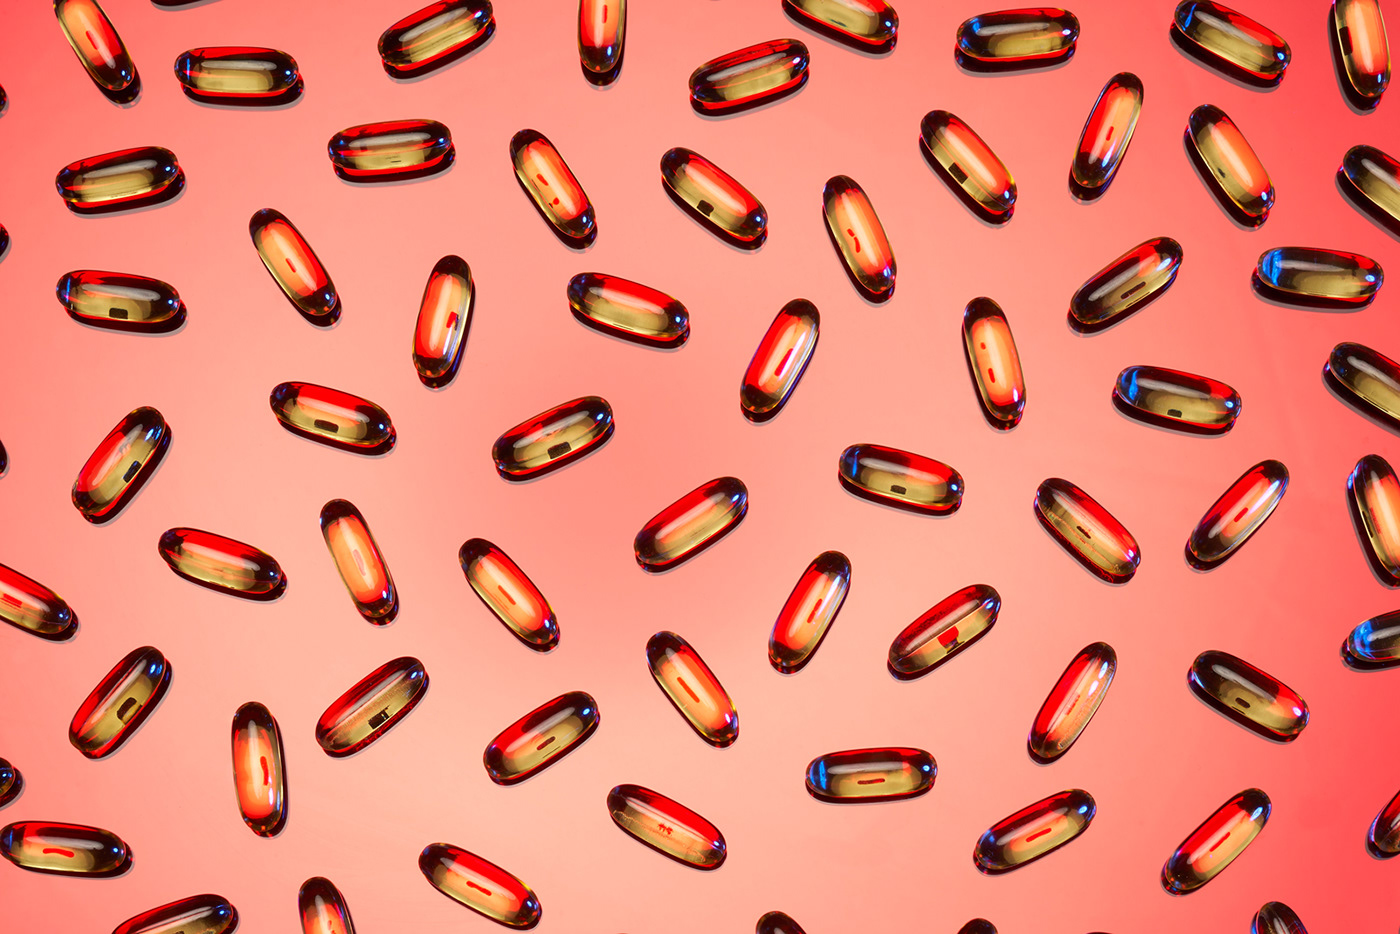 conceptual Health lockdown macro Nature still life Adobe Creative Residency daily life details pandemic